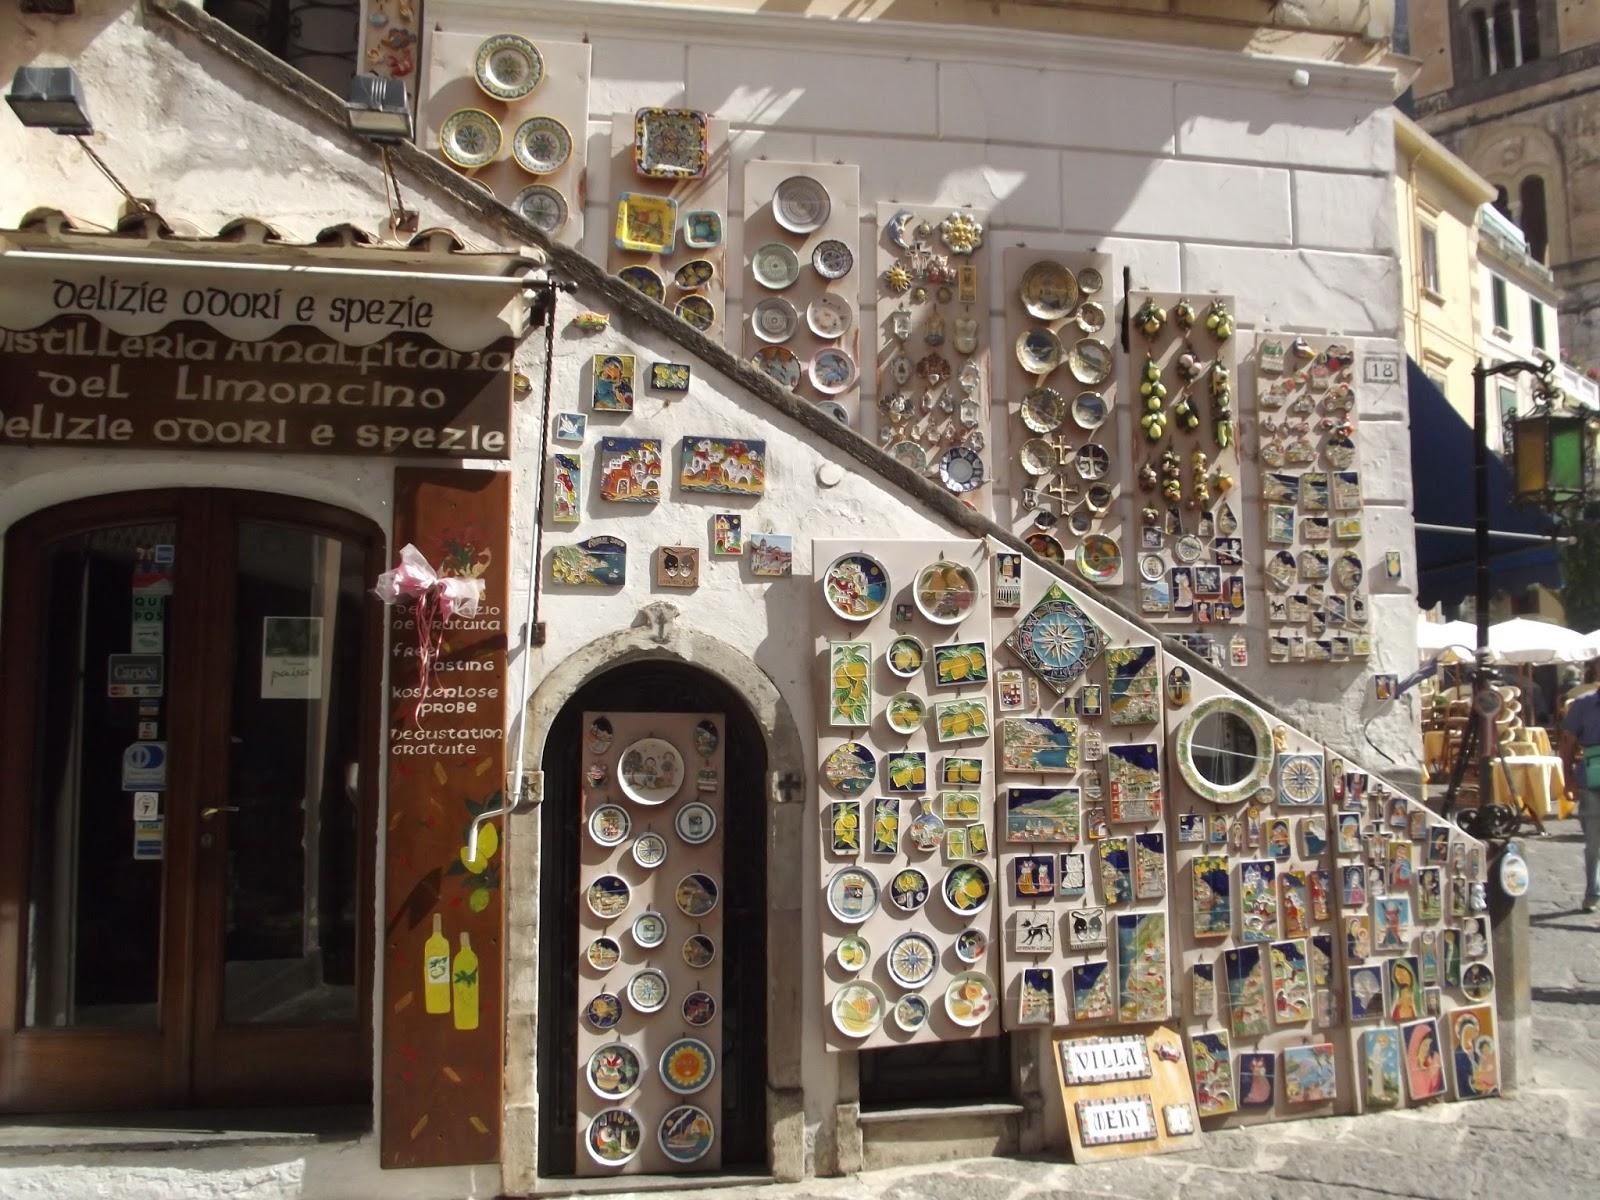 Fashion tour moda e artigianato in italia - Porta portese milano ...